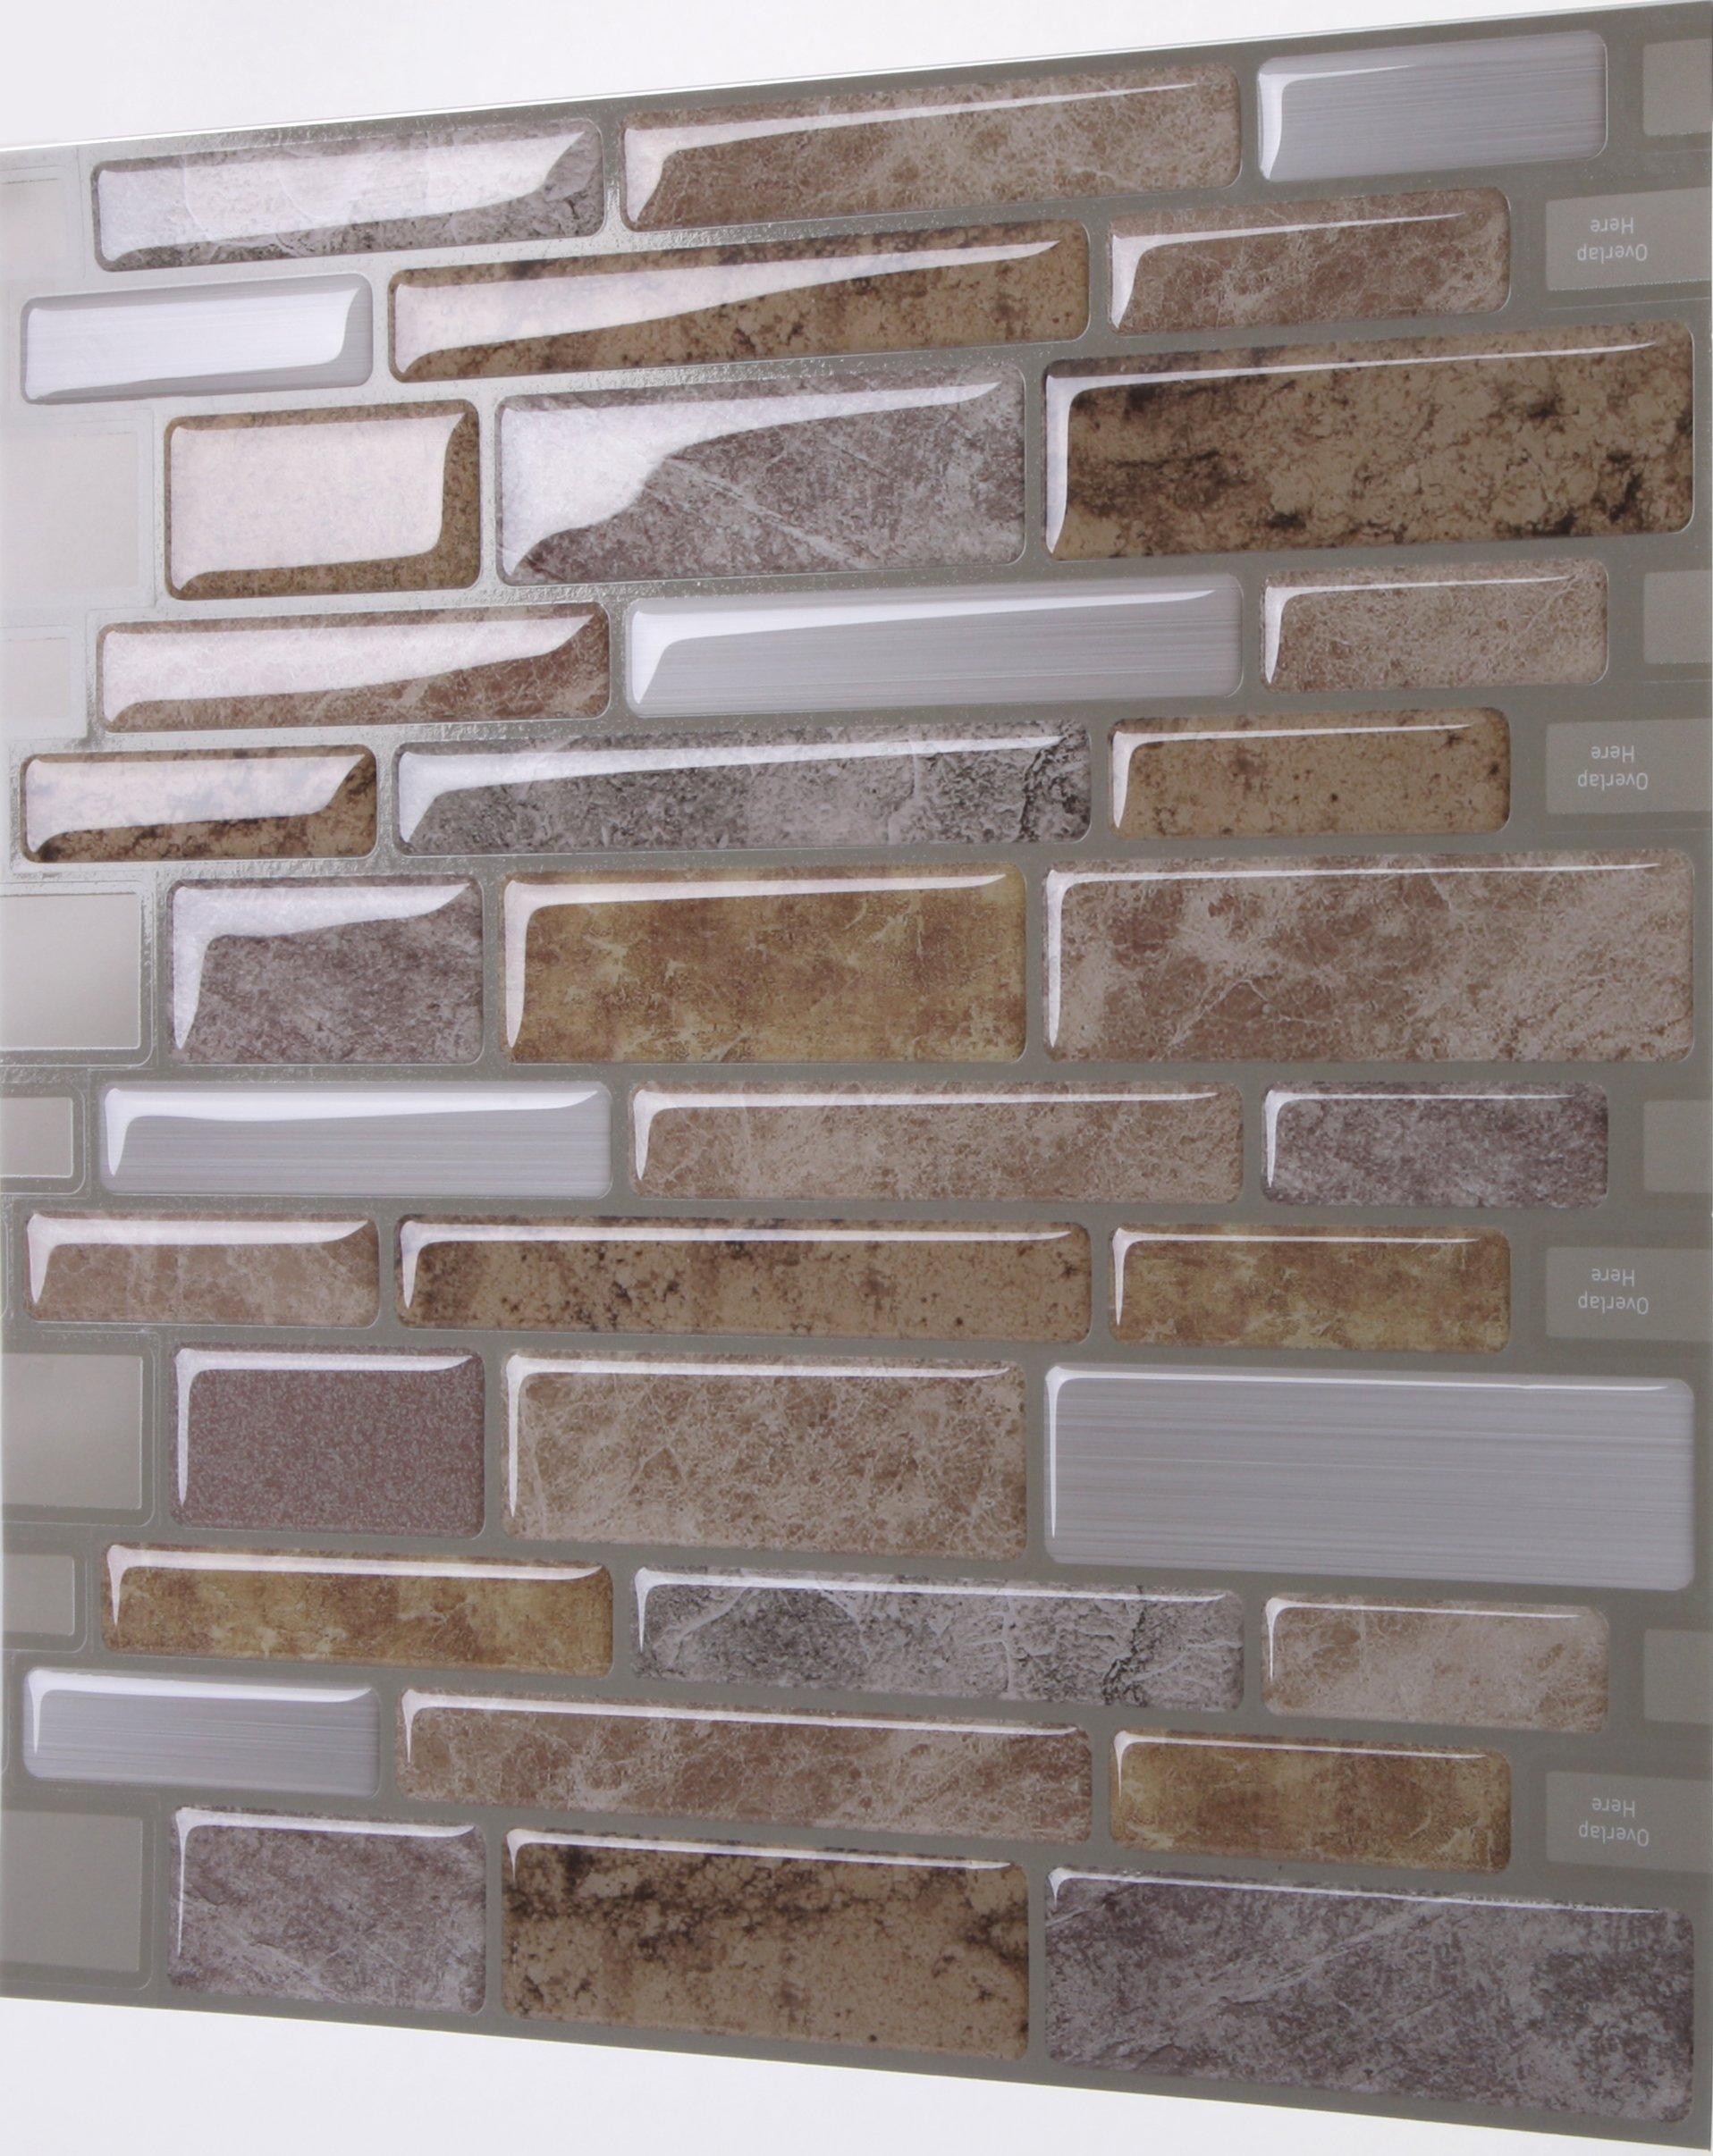 tic tac tiles anti mold peel and stick wall tile in polito fresco 10 tiles 636225638805 ebay. Black Bedroom Furniture Sets. Home Design Ideas